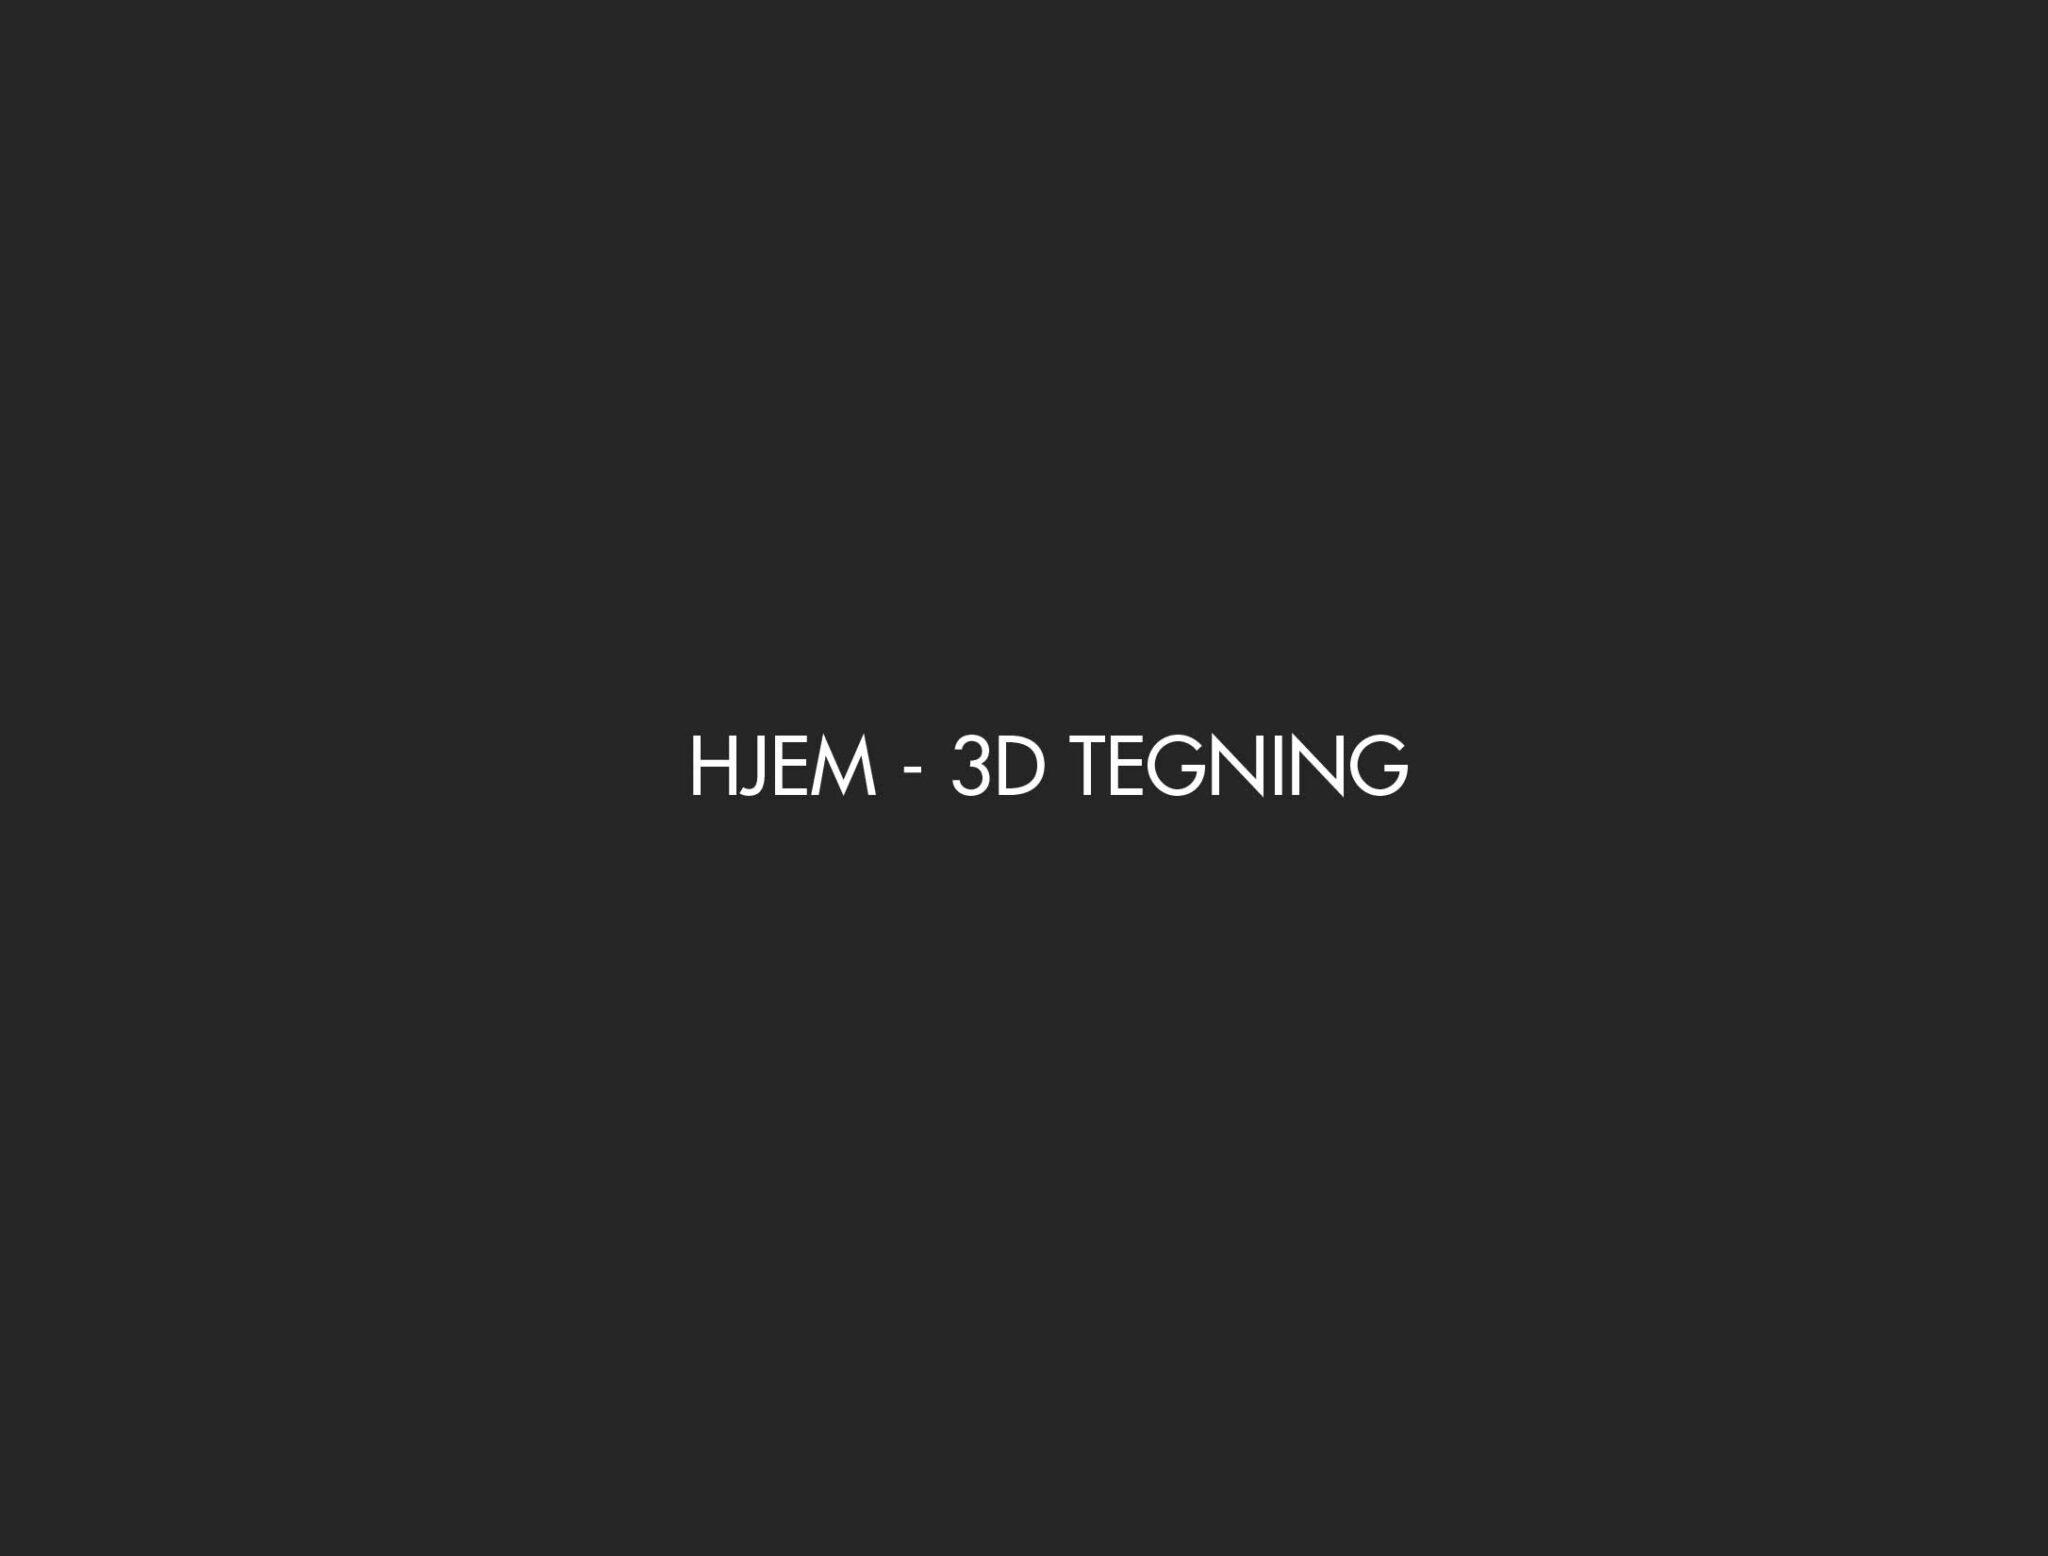 3D IDÉ-PROSJEKT